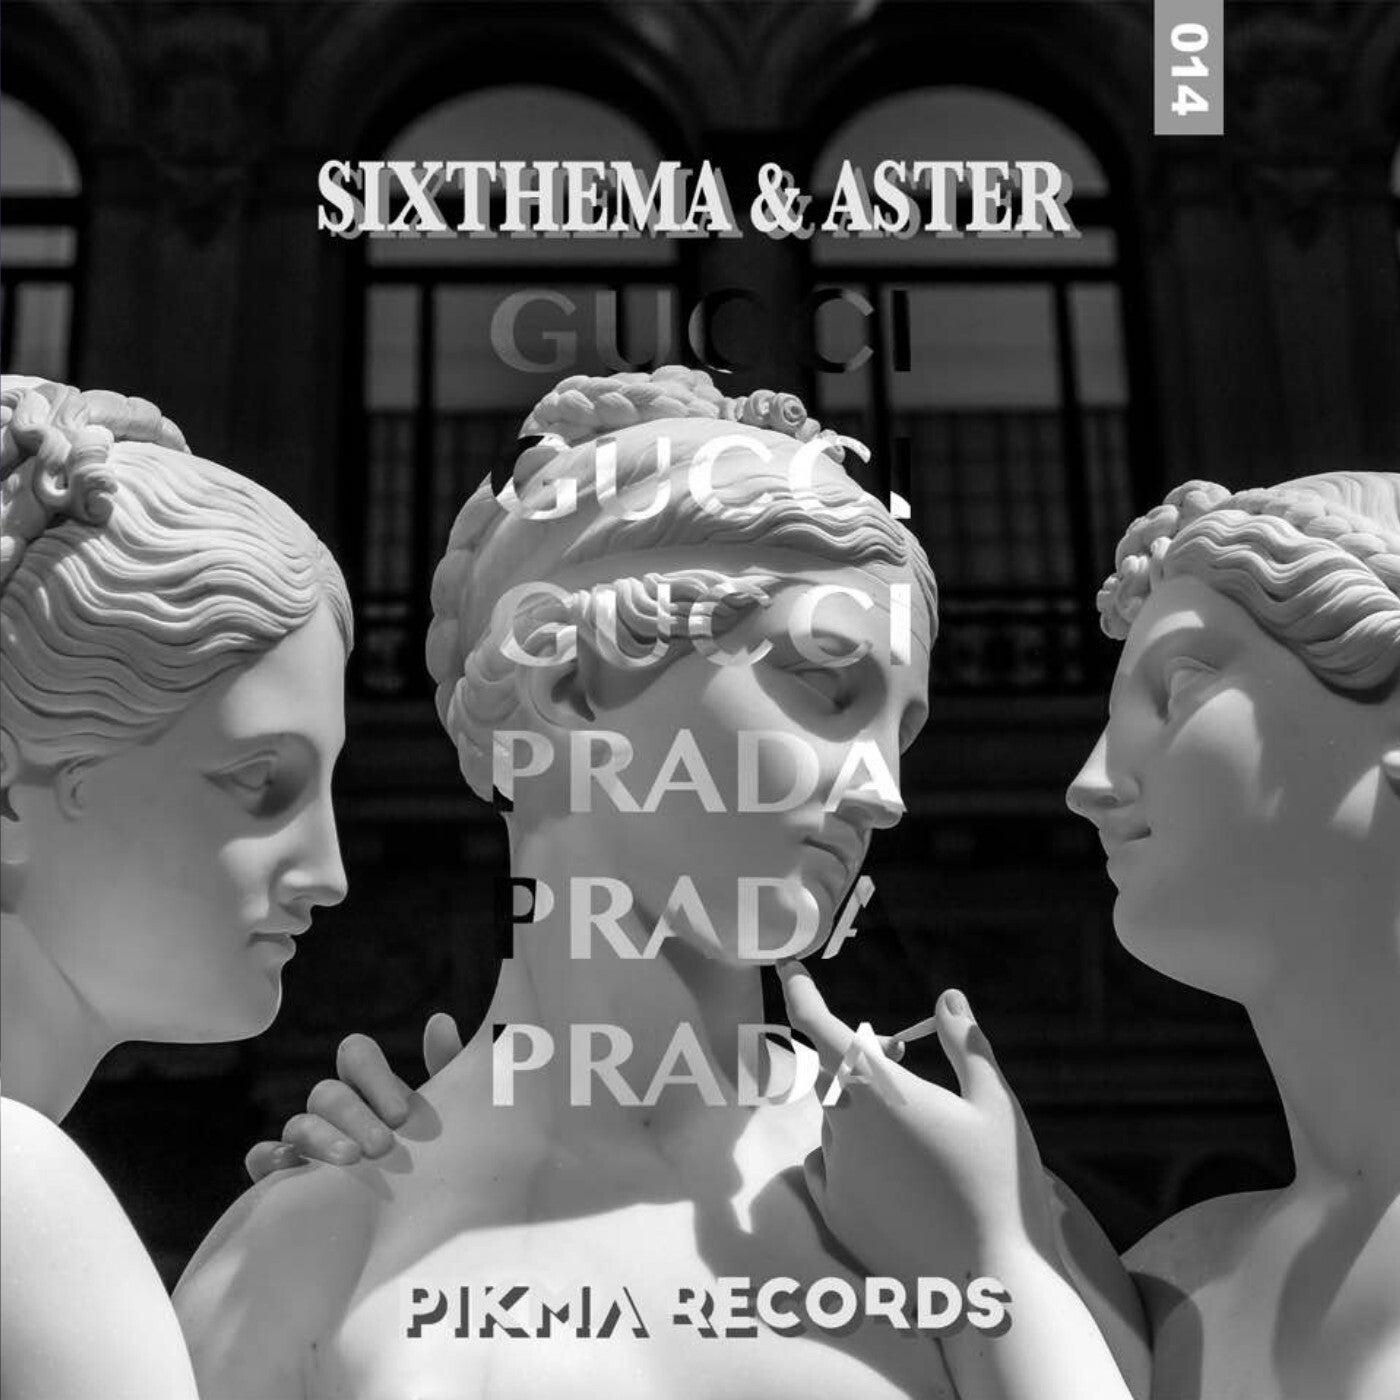 GUCCI PRADA (Original Mix)